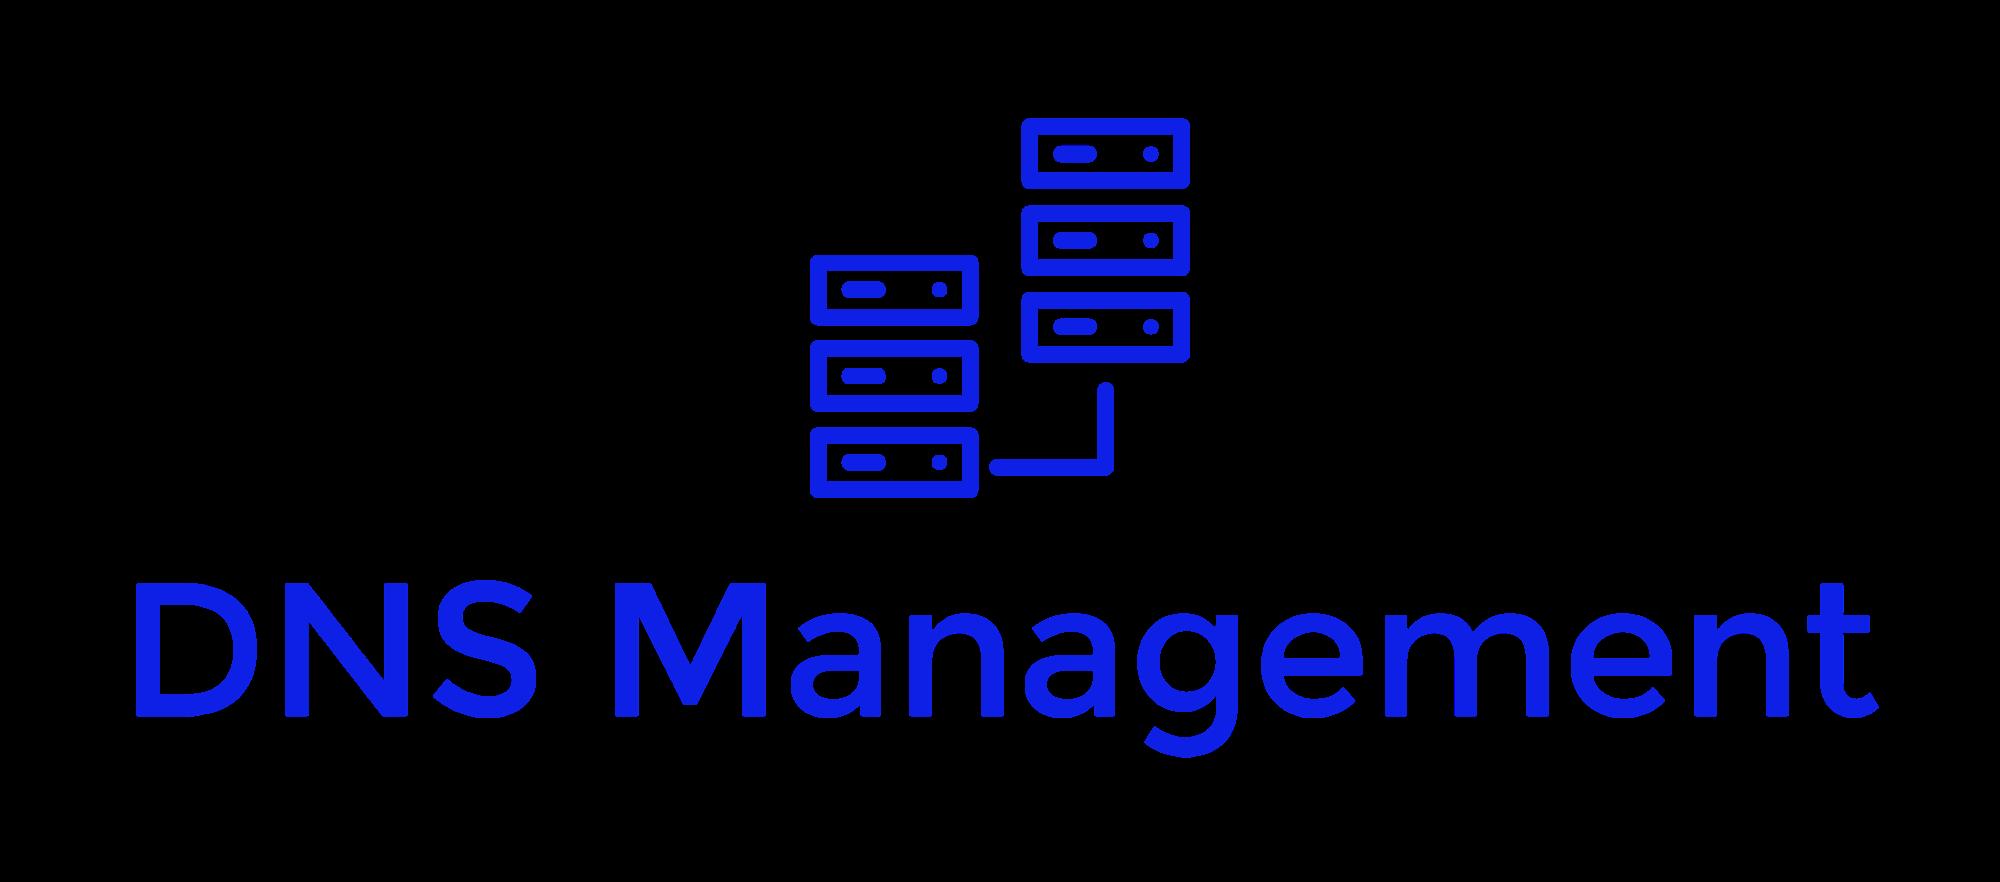 DNS Management-logo.png